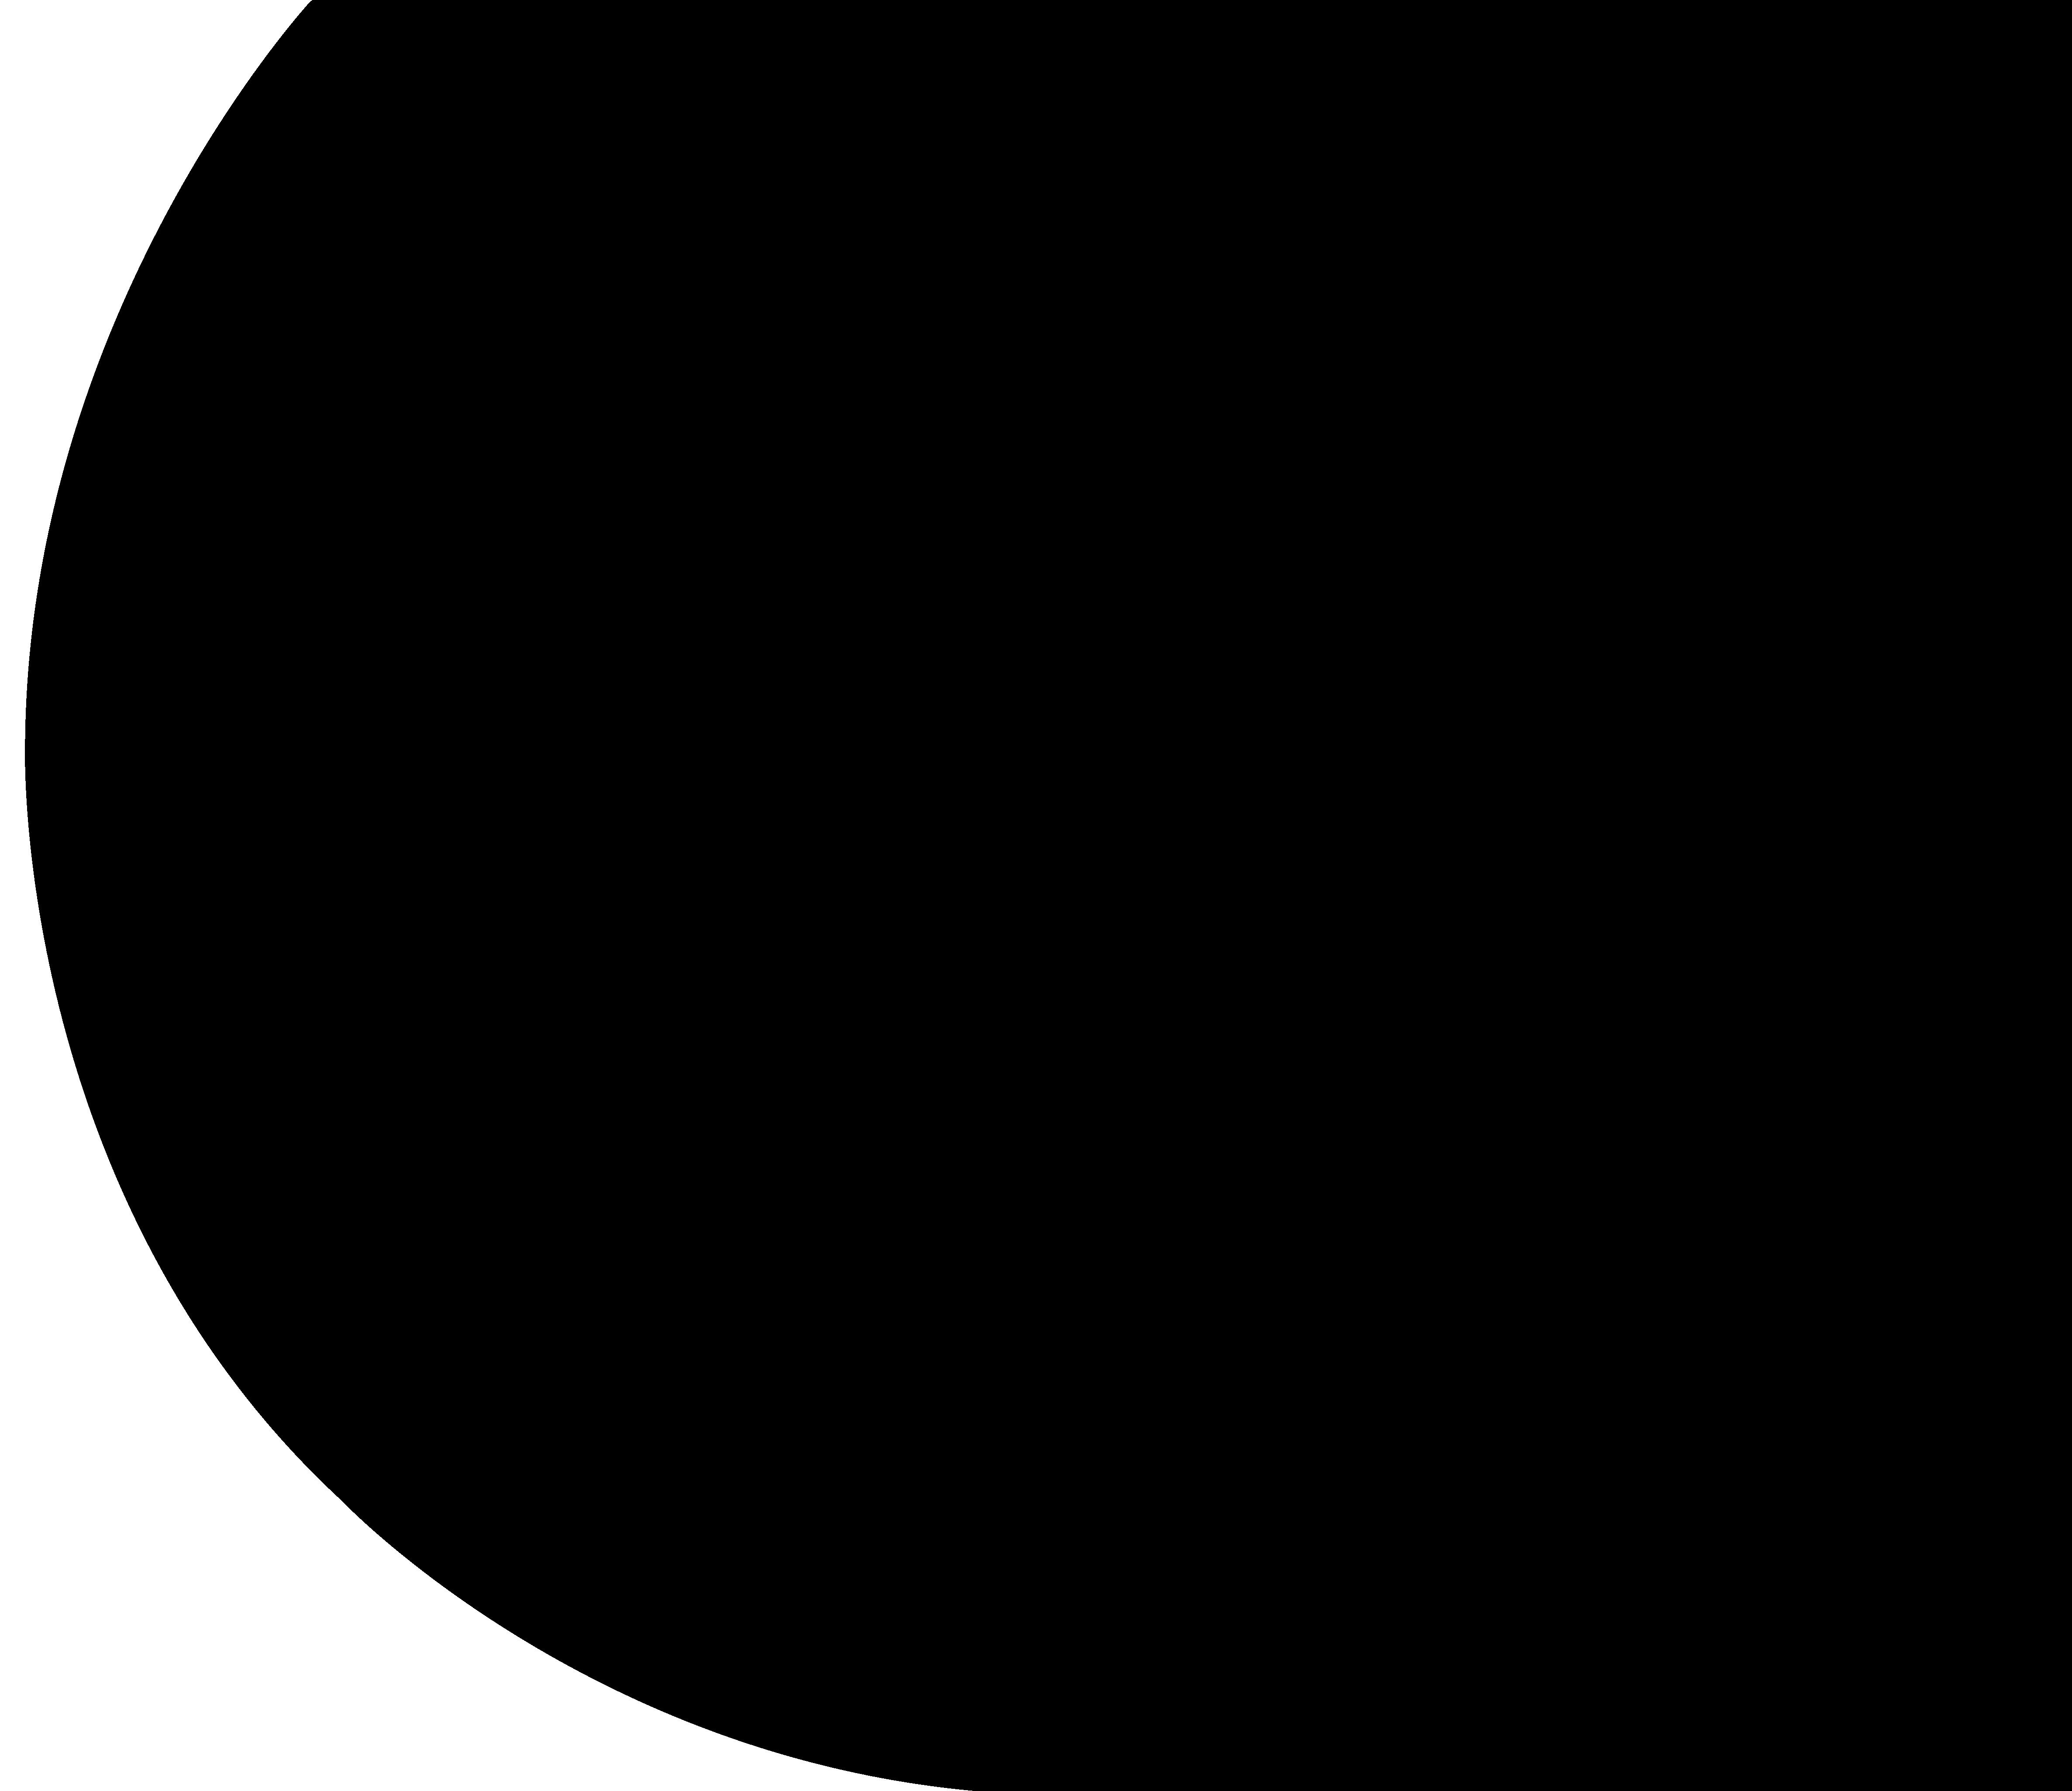 curve overlay